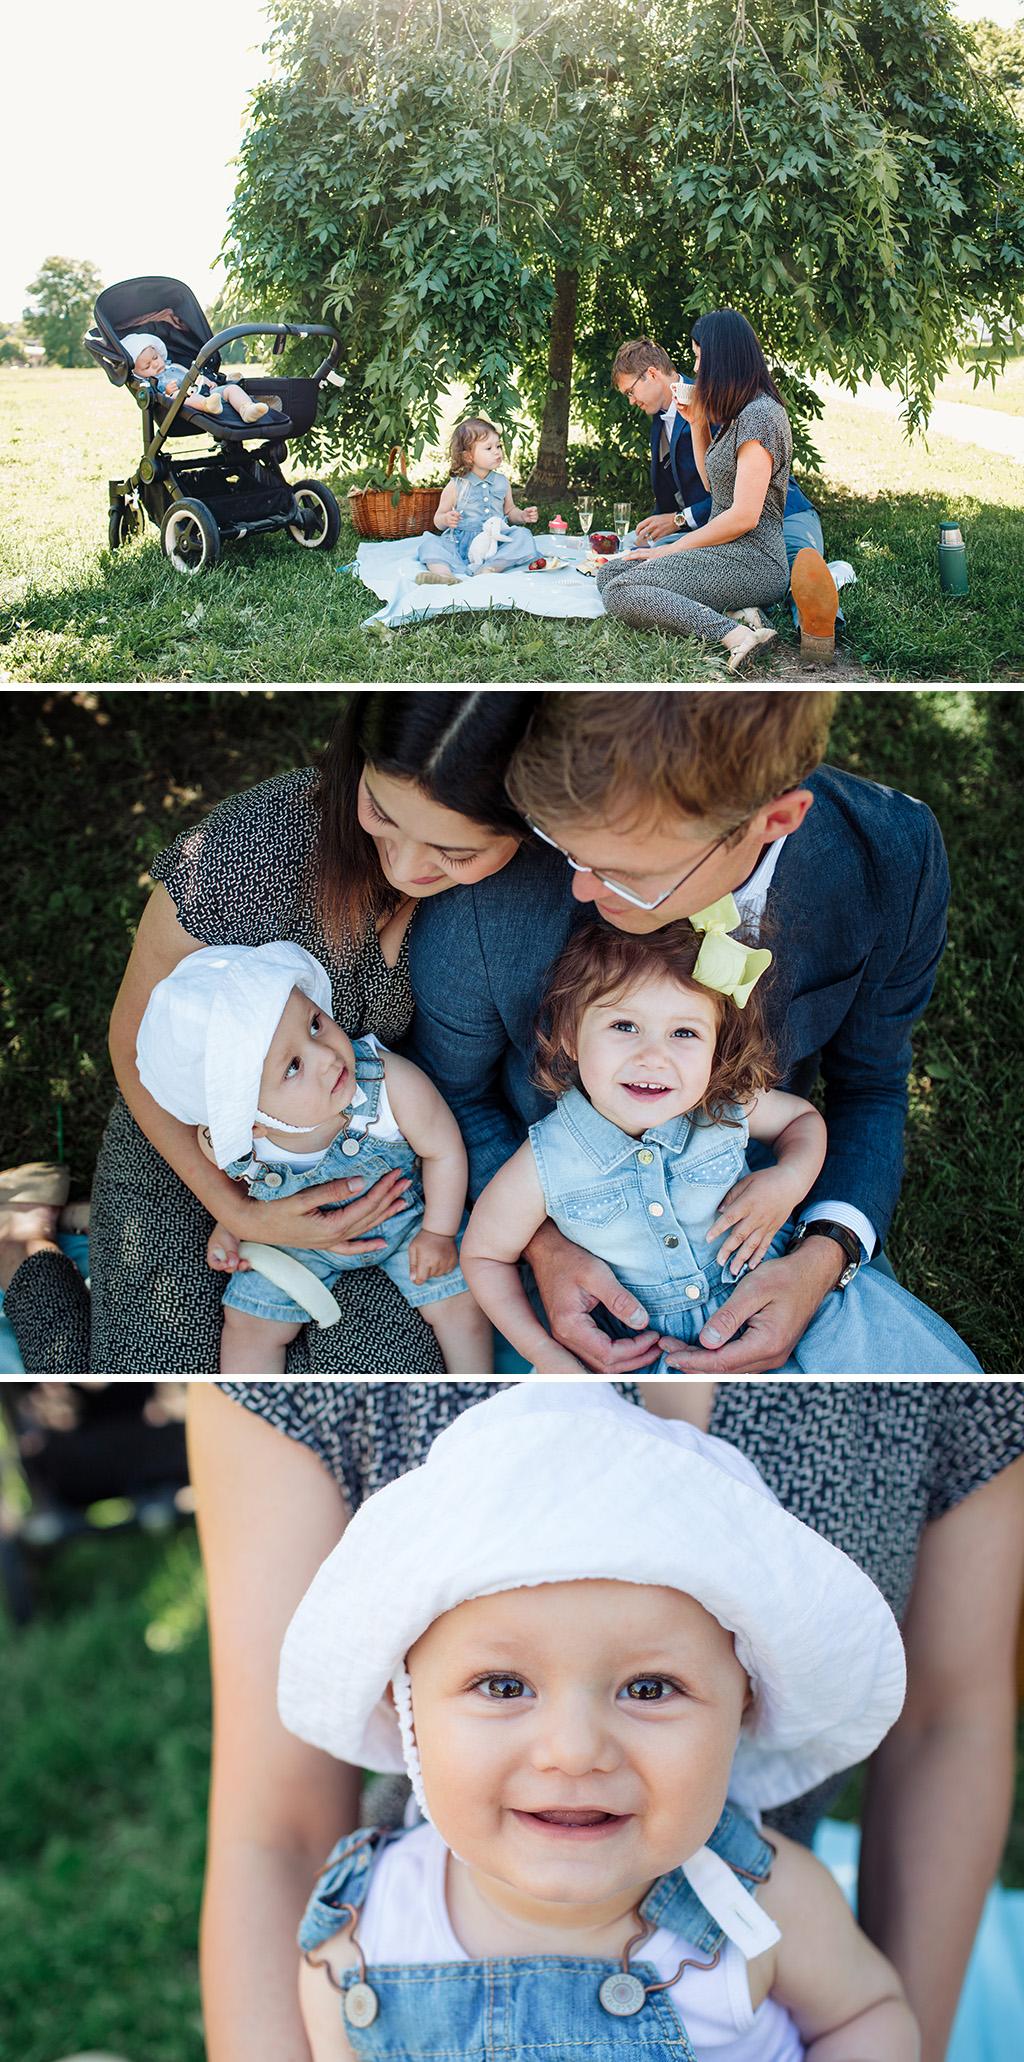 Lfiestyle-familjefotografering-Stockholm_Anna-Sandstrom.jpg